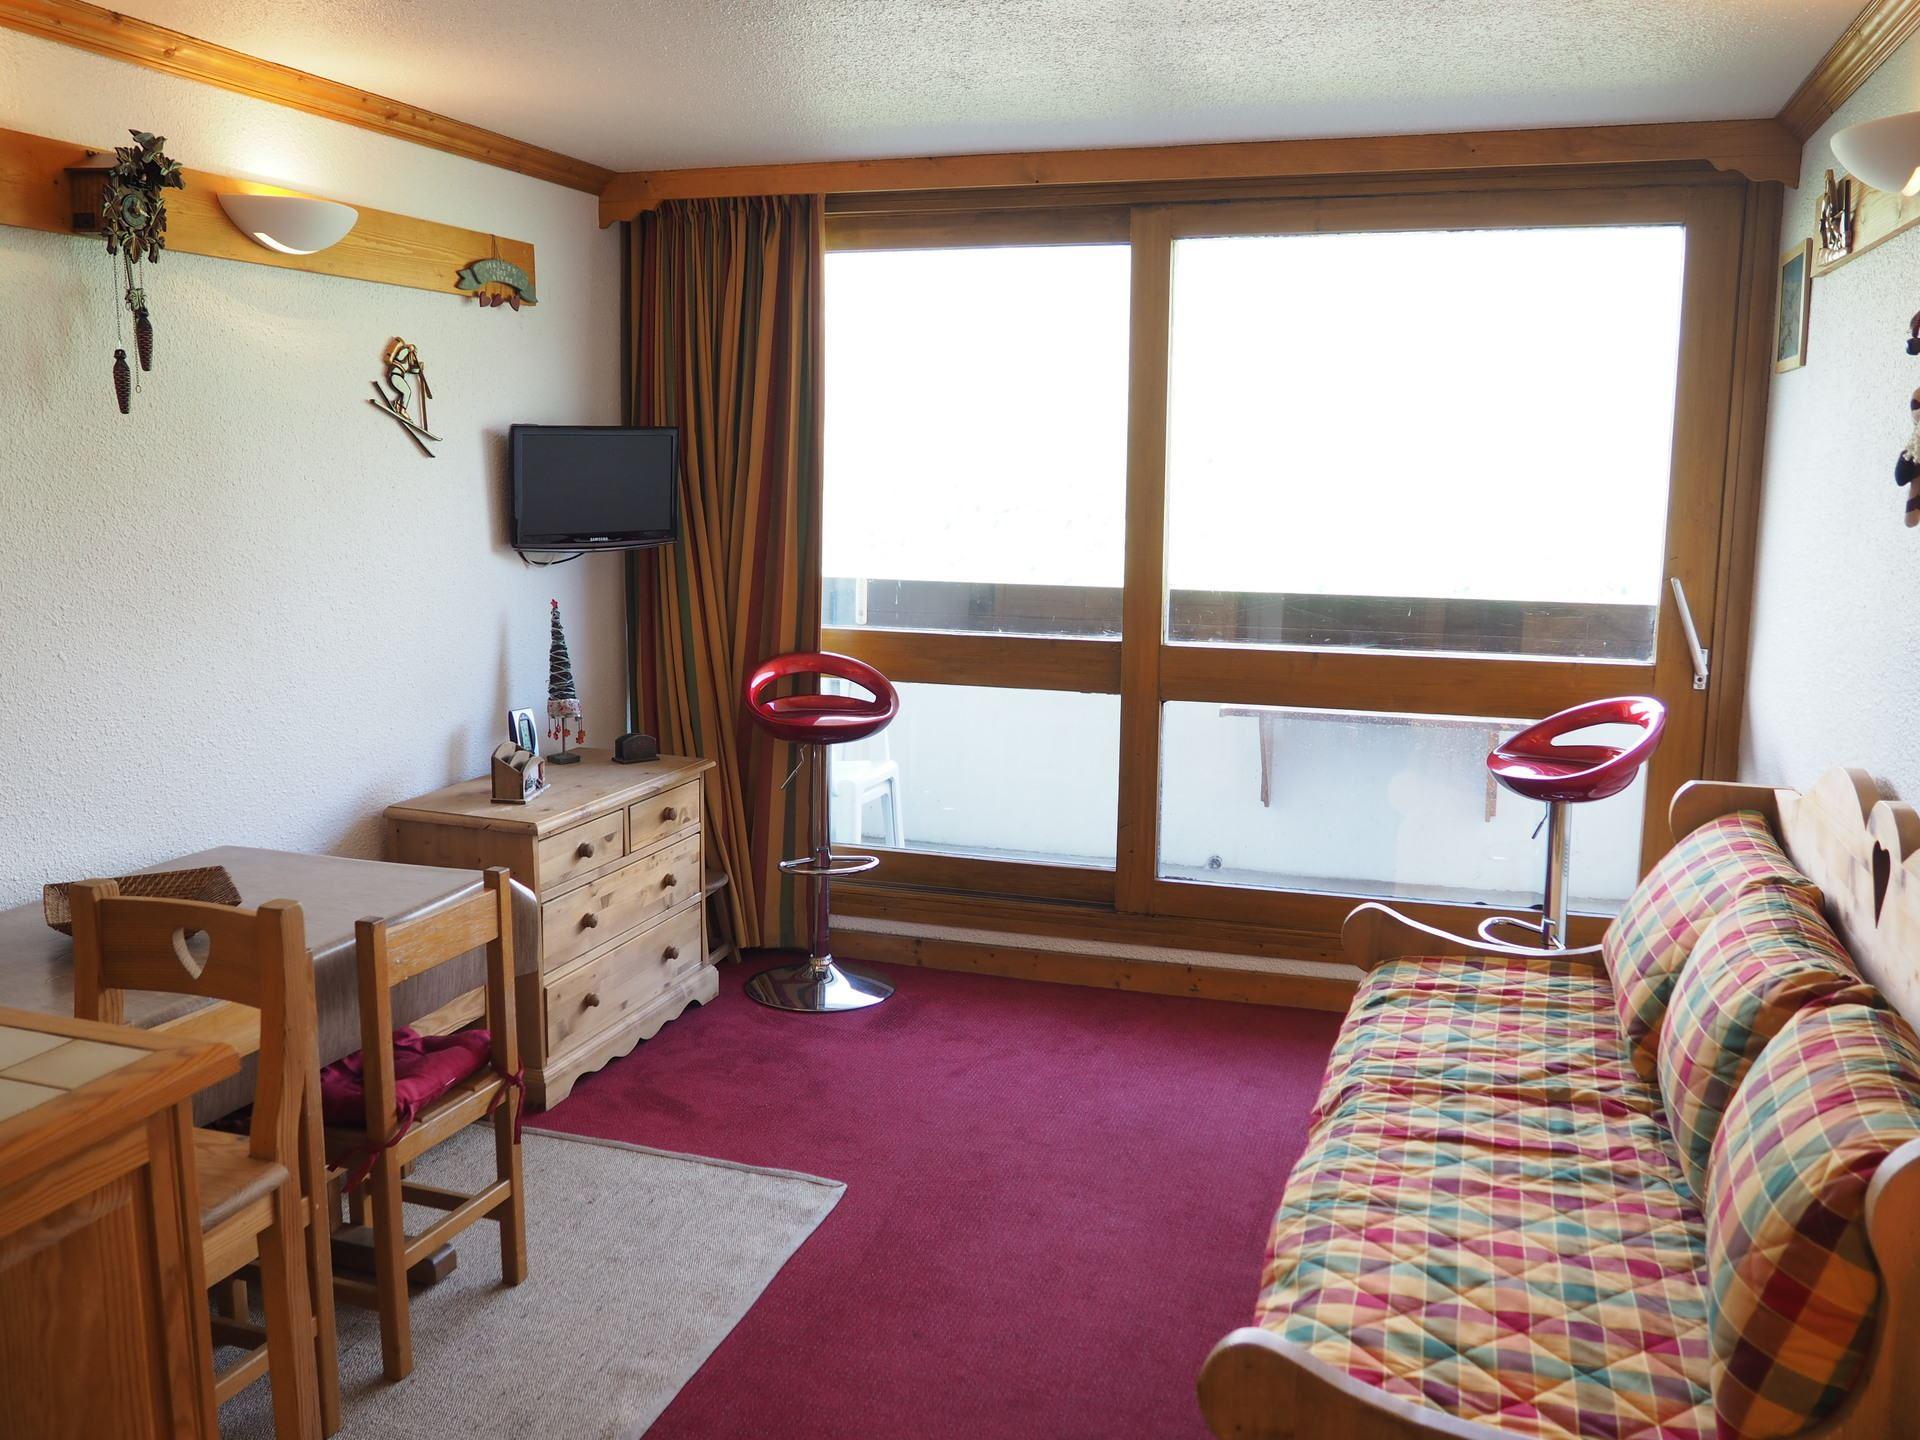 4 Pers Studio ski-in ski-out / COTE BRUNE 213